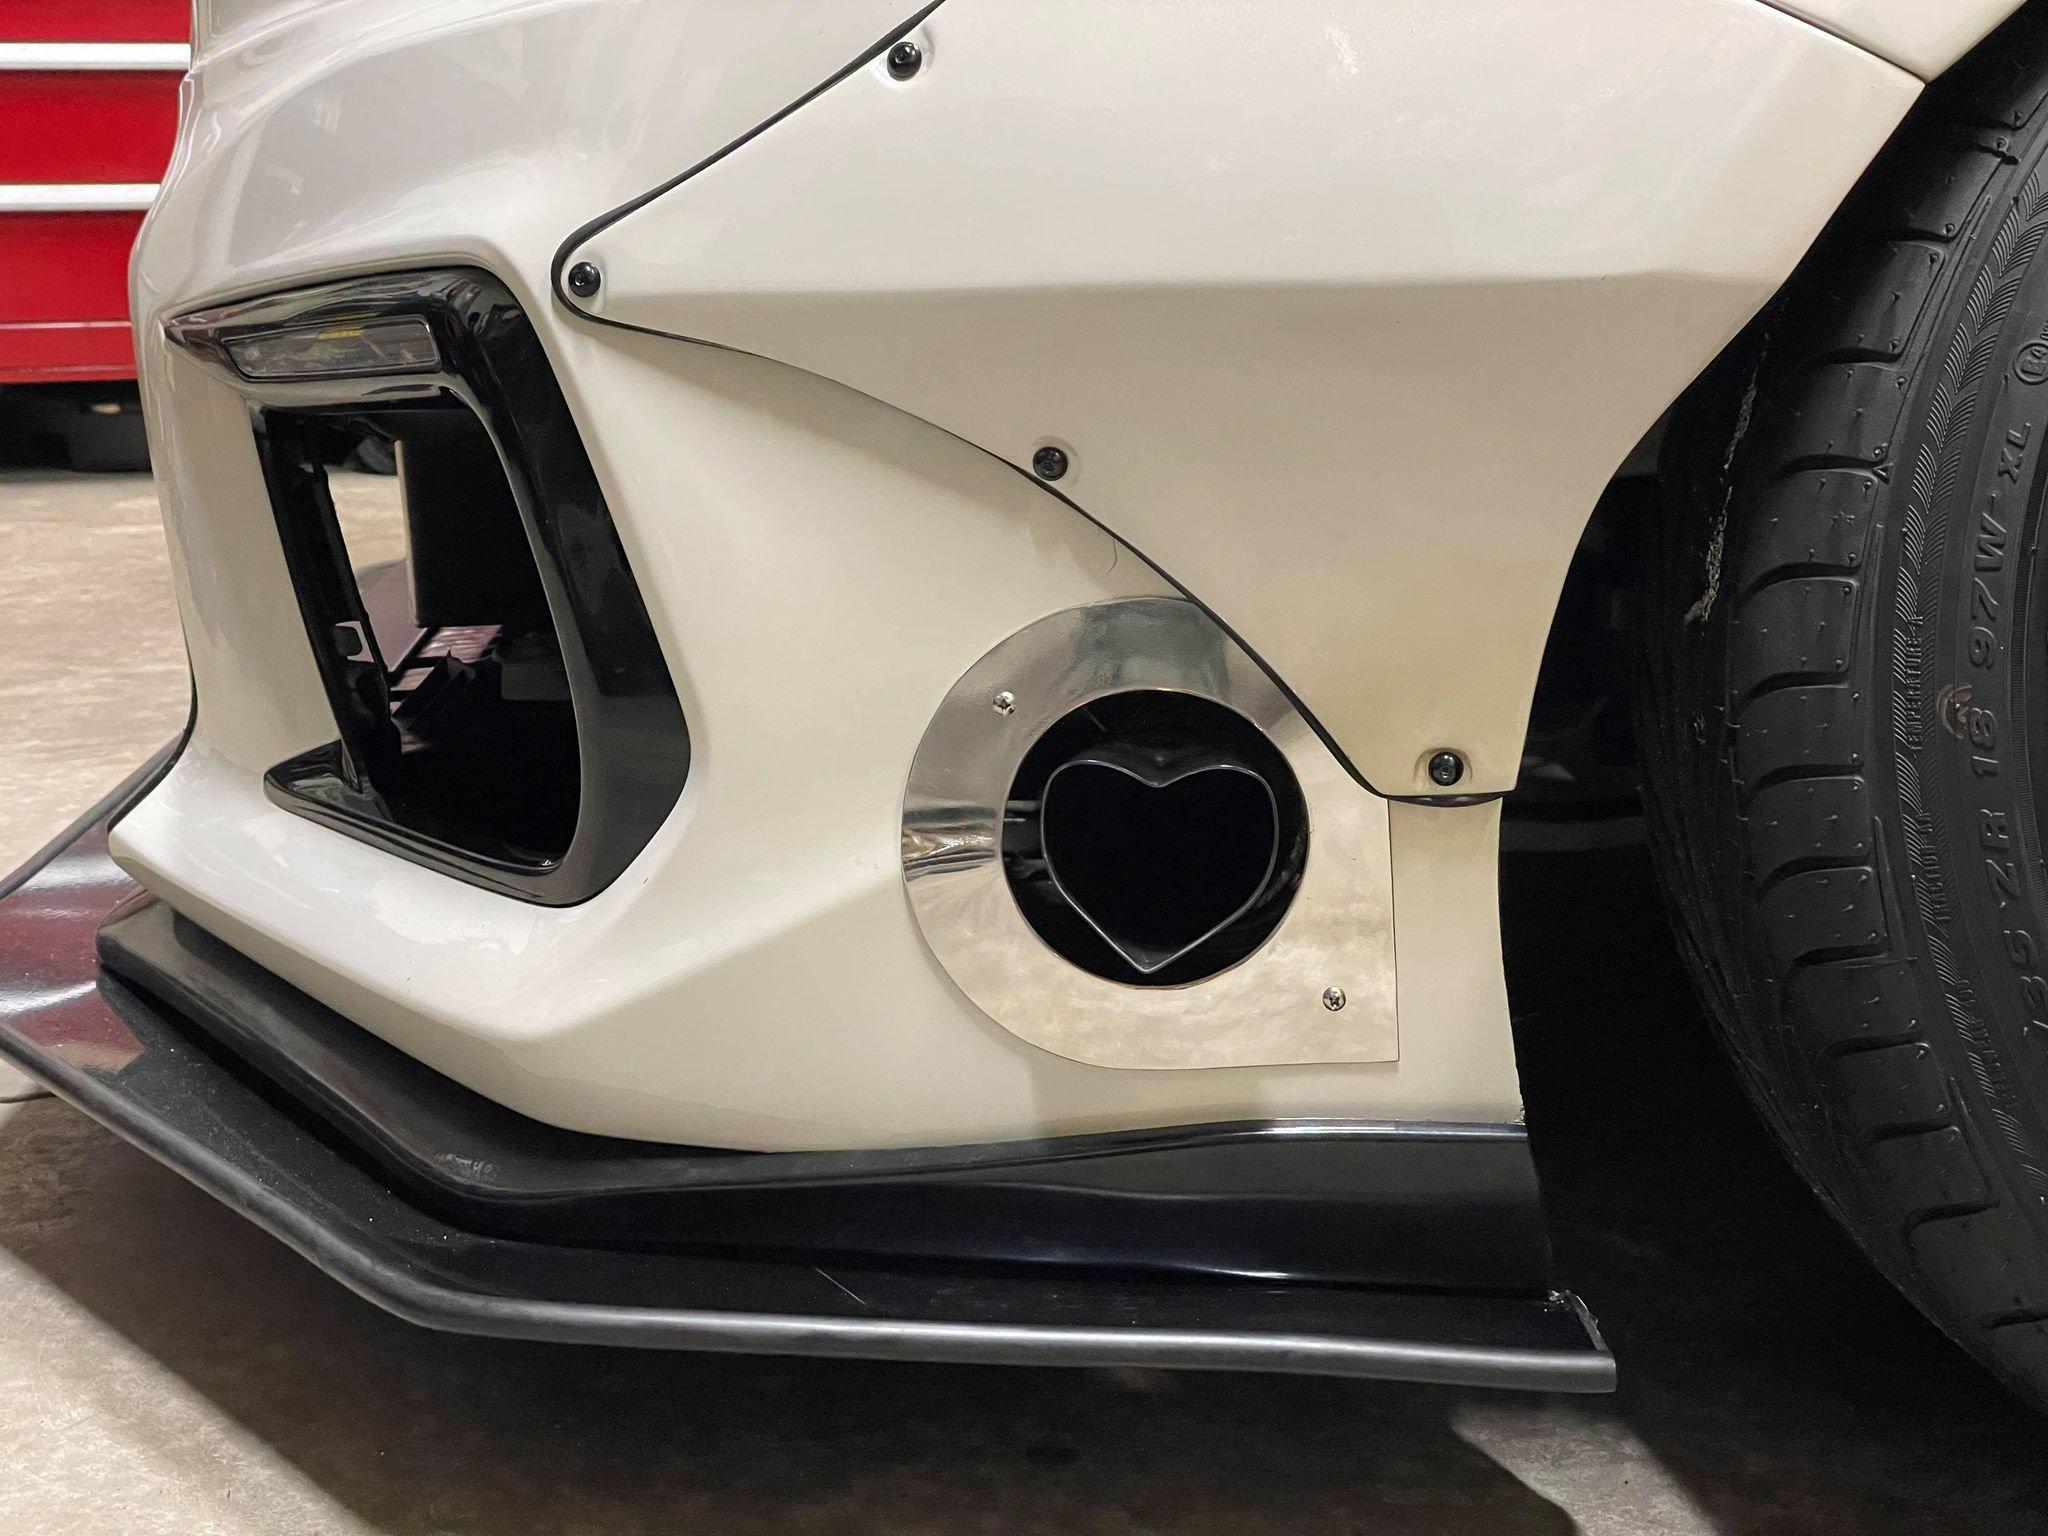 sbtk side exit exhaust 3in 2015 wrx only sbtkdeletes